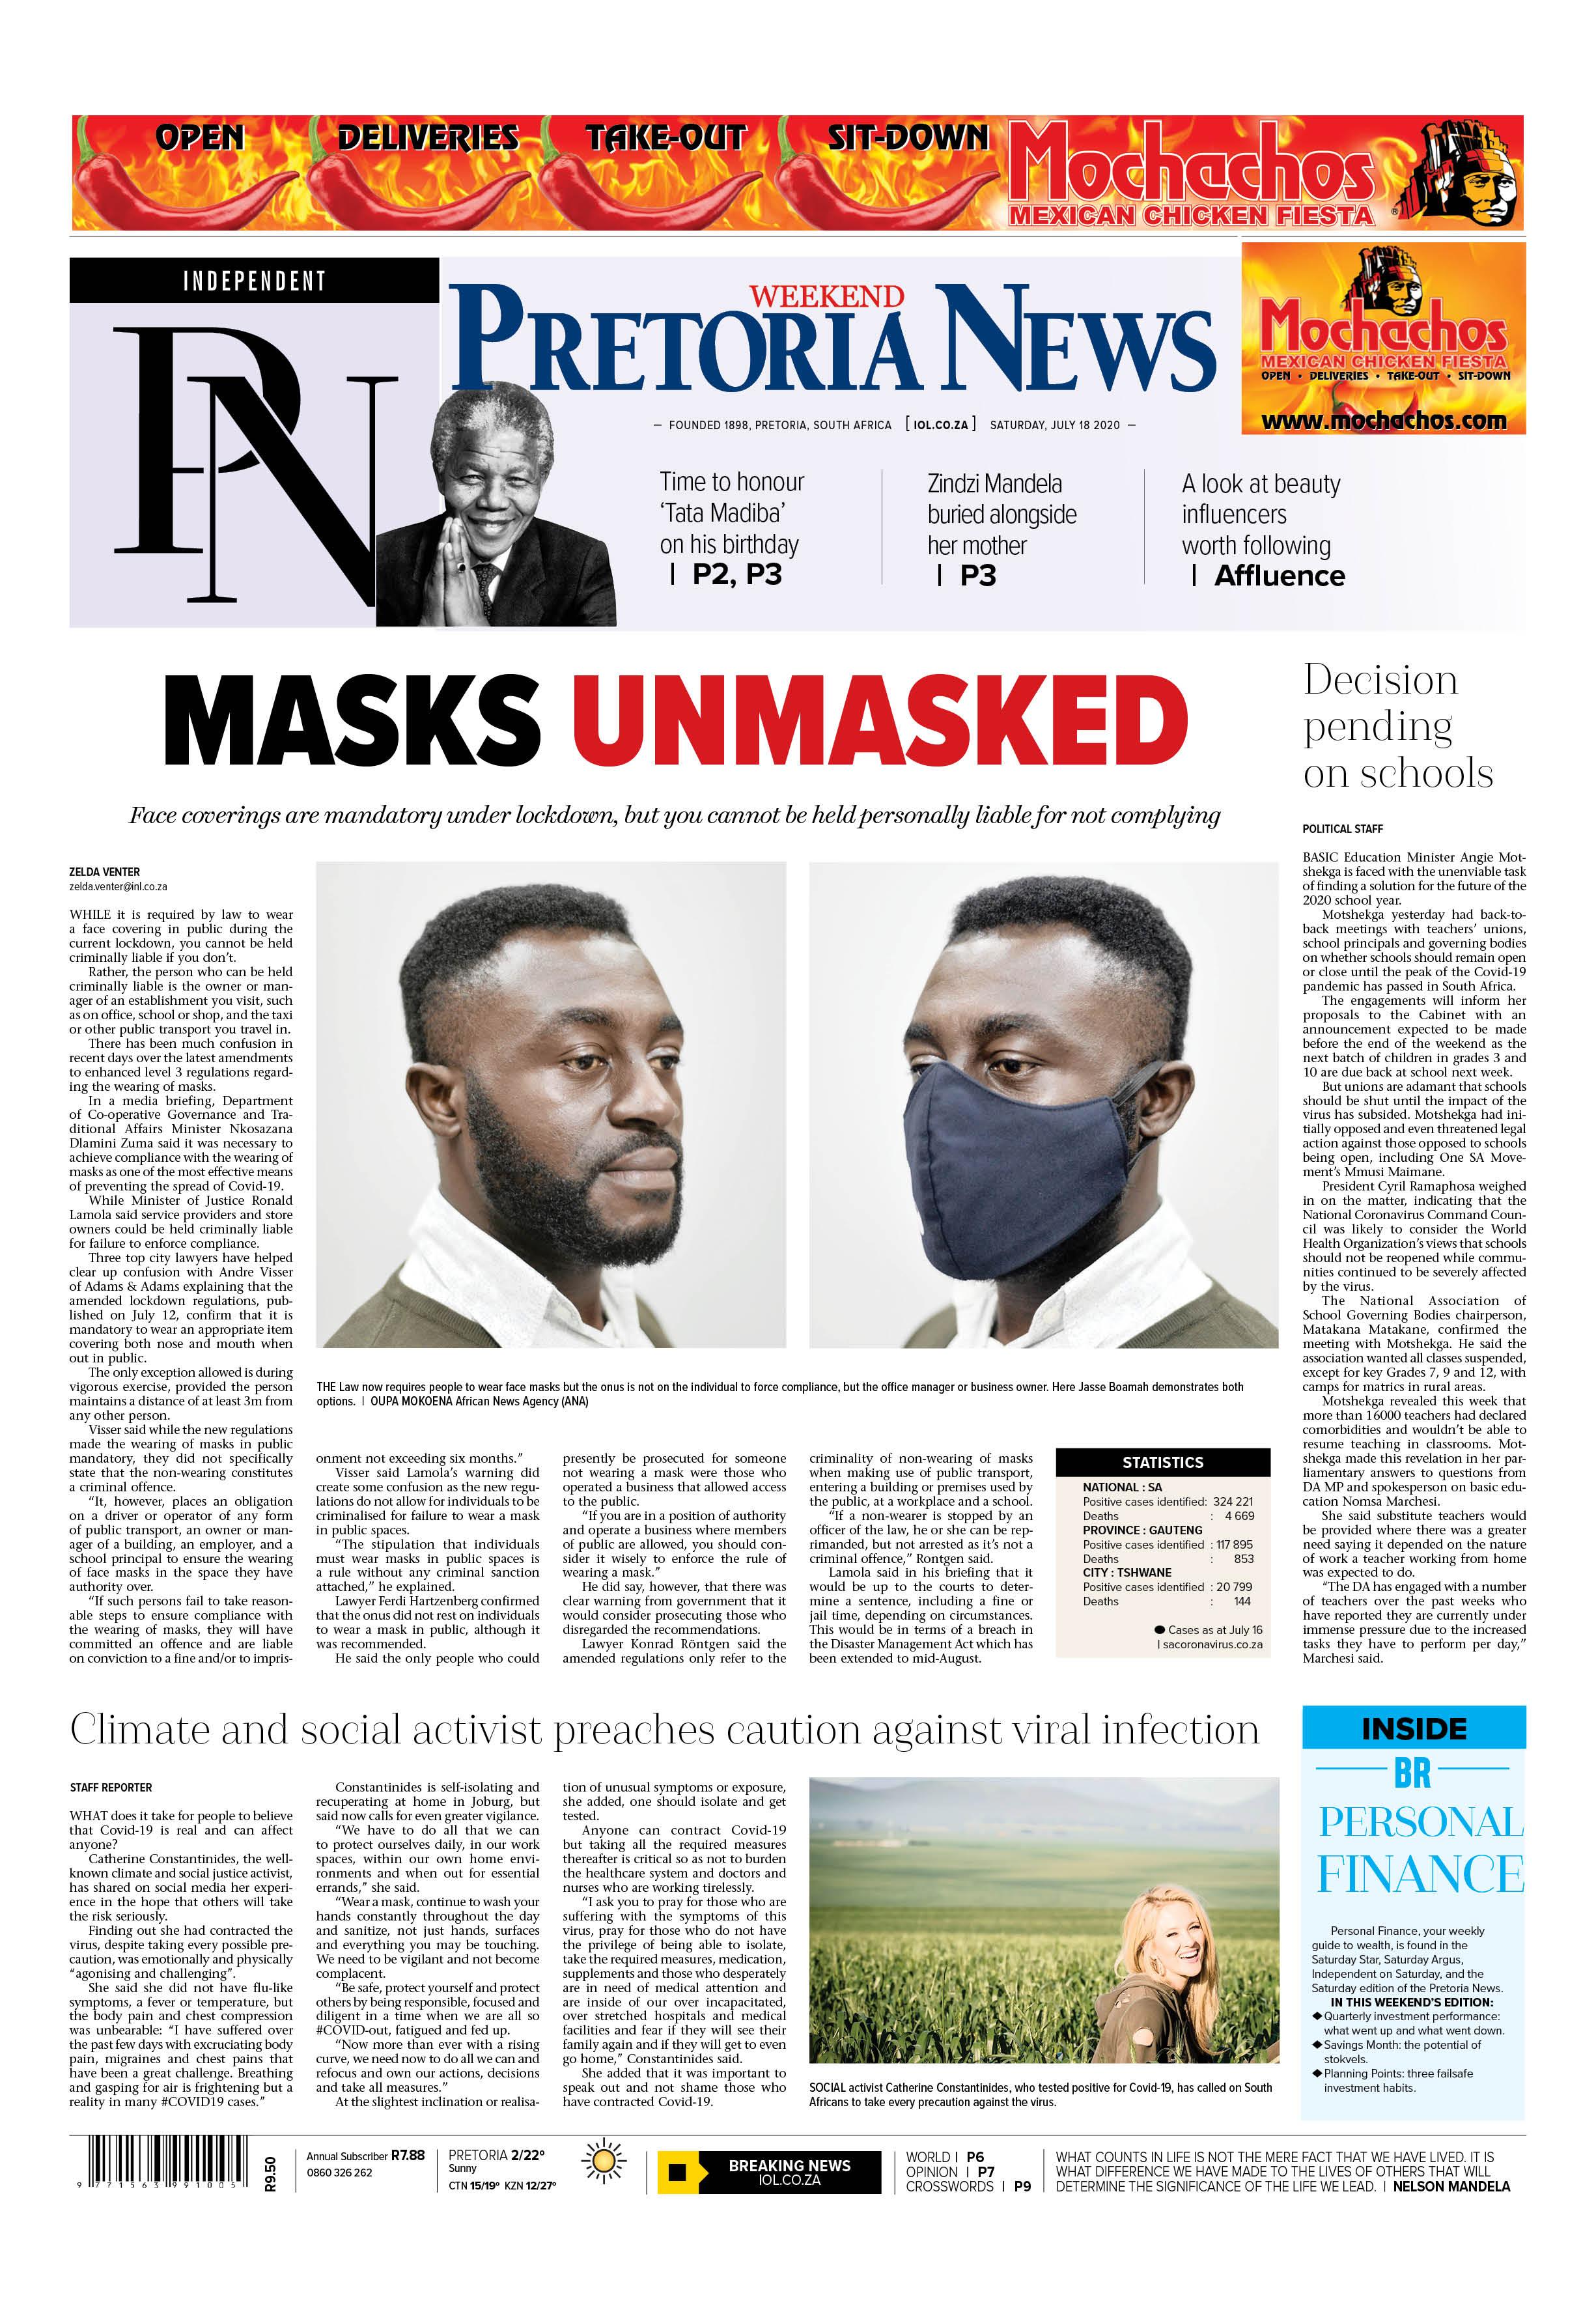 Pretoria News Weekend July 18 2020